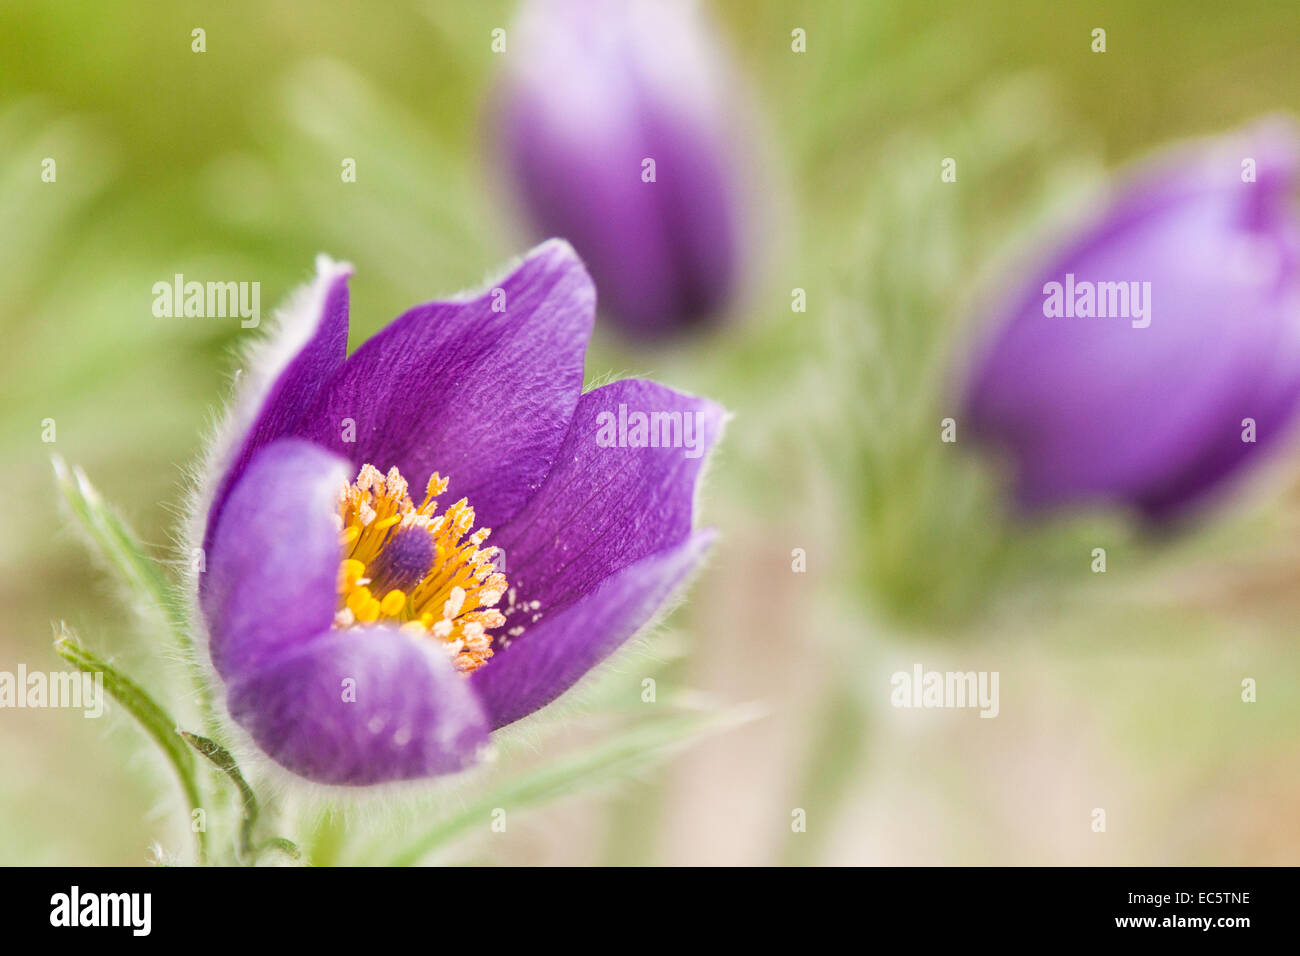 pasque flower Stock Royalty Free Image Alamy